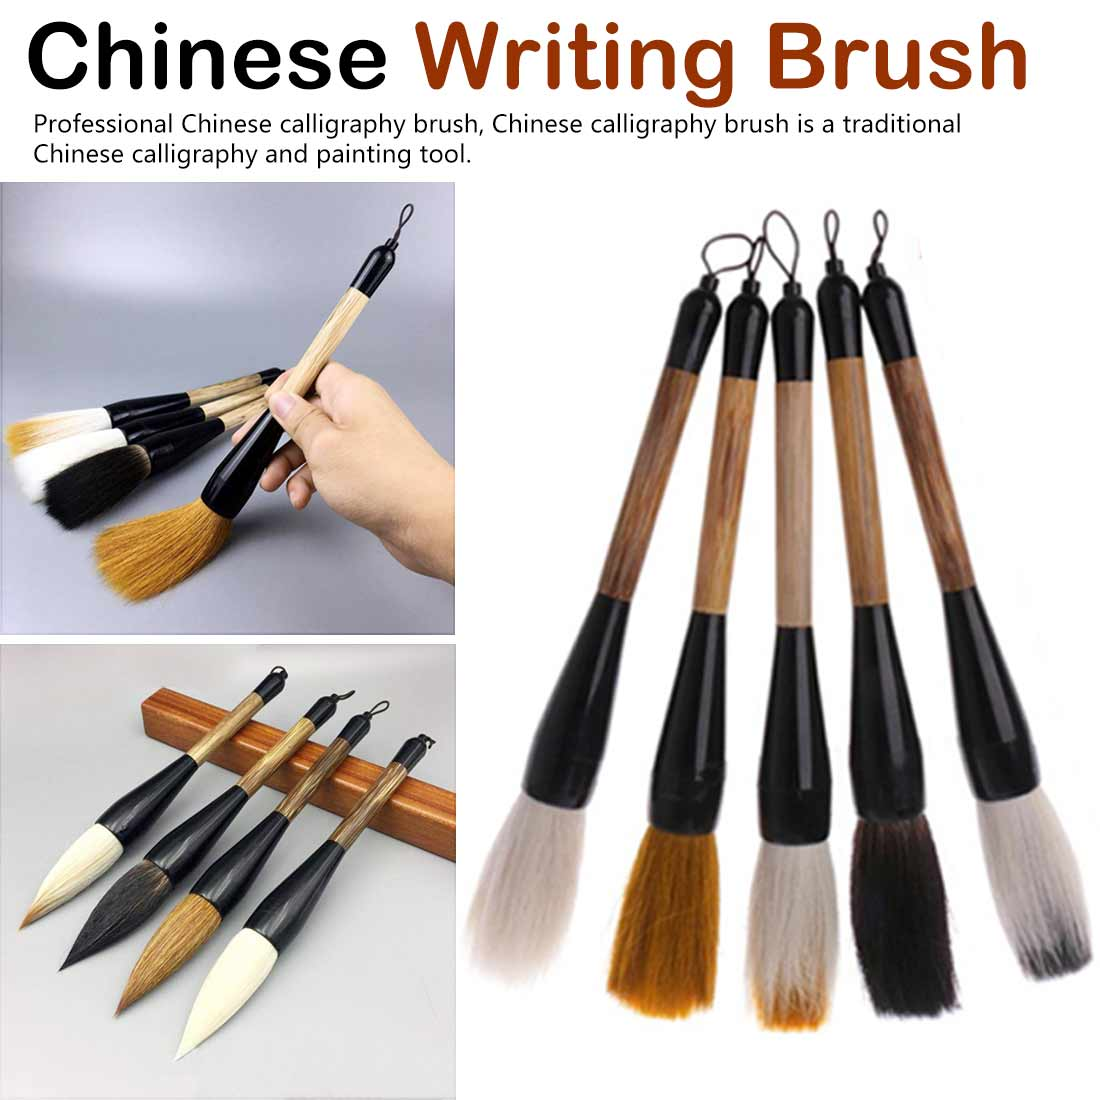 5 Styles Chinese Oil Painting Brush Calligraphy Brush Pen Goat Hair Bamboo Shaft Paint Brush Art Stationary